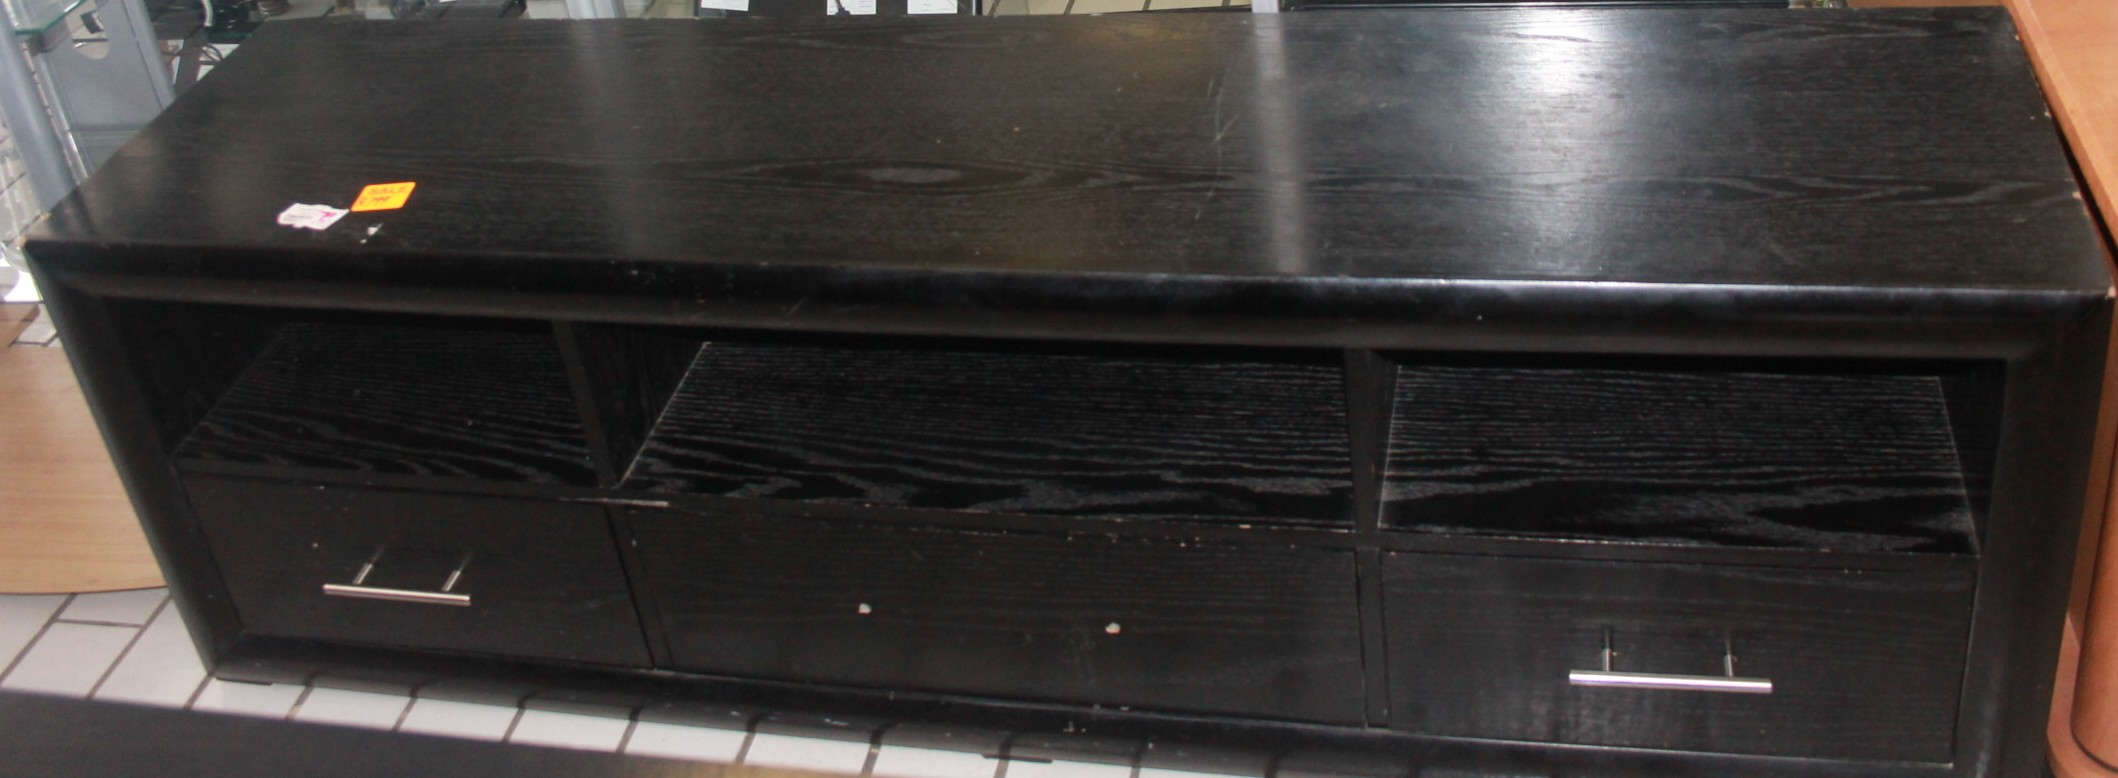 Black plasma stand S026532a #Rosettenvillepawnshop